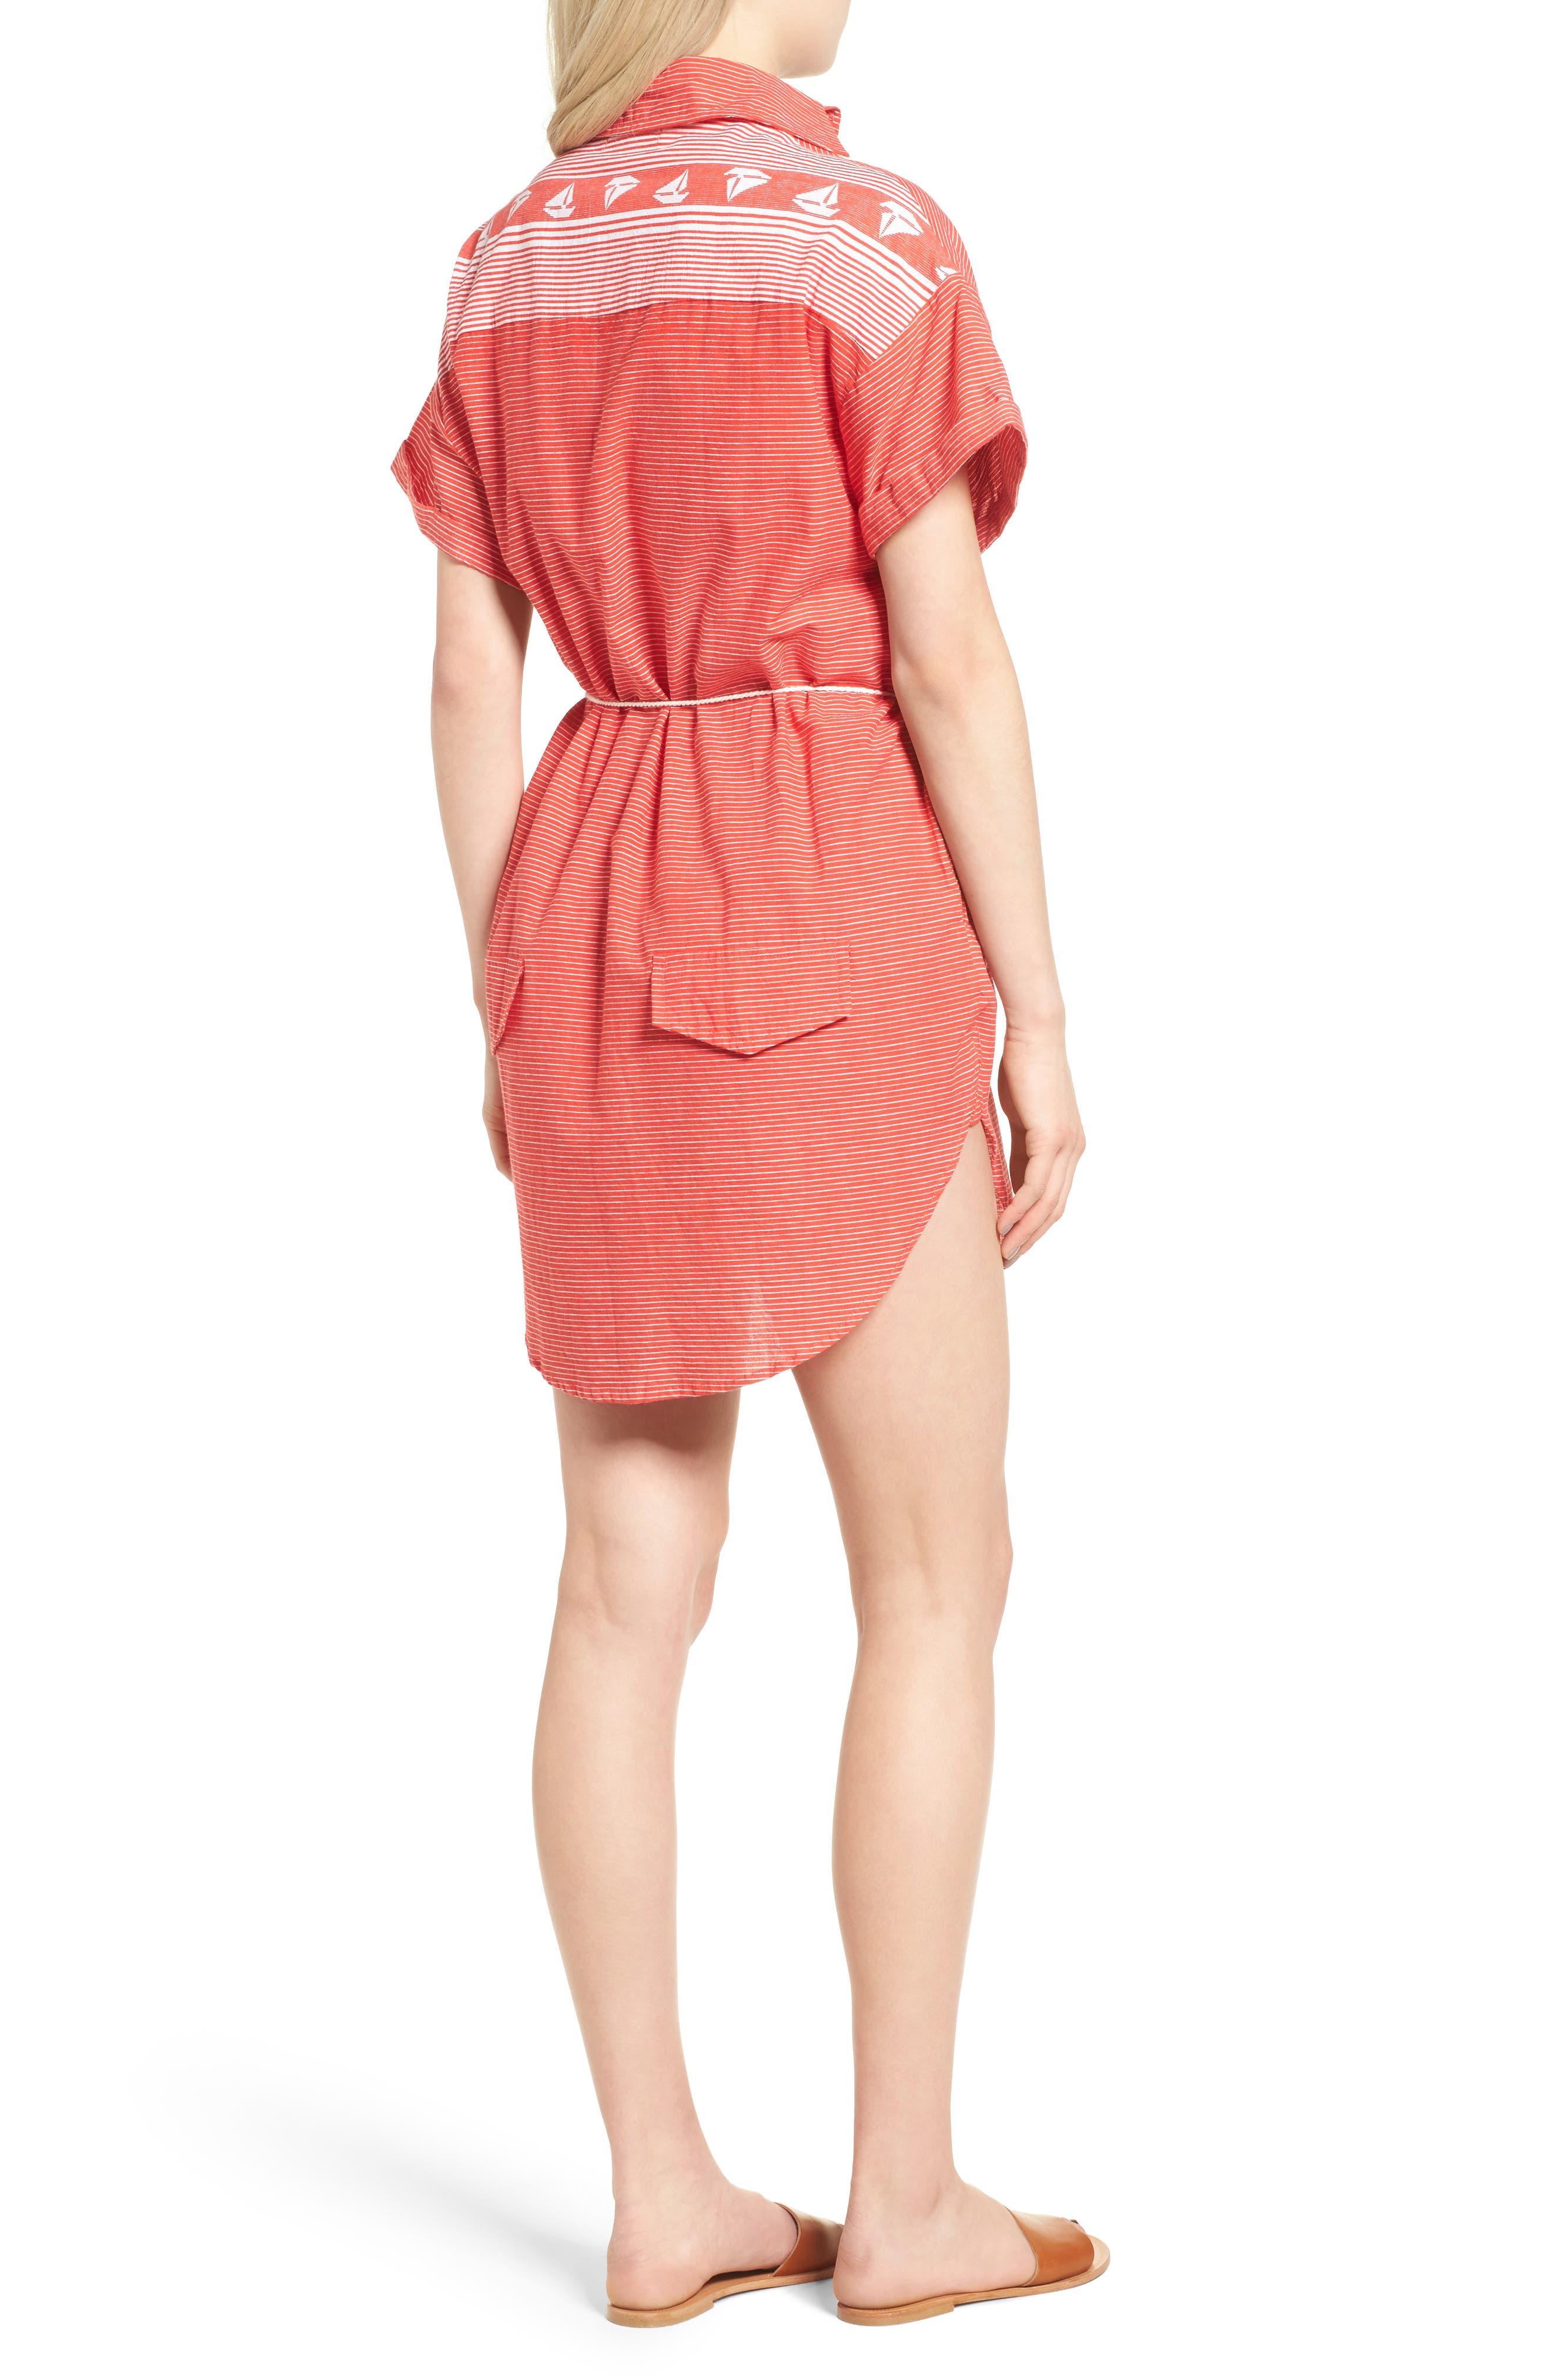 Avalon Cotton Shirtdress,                             Alternate thumbnail 3, color,                             Deep Sea Print Red